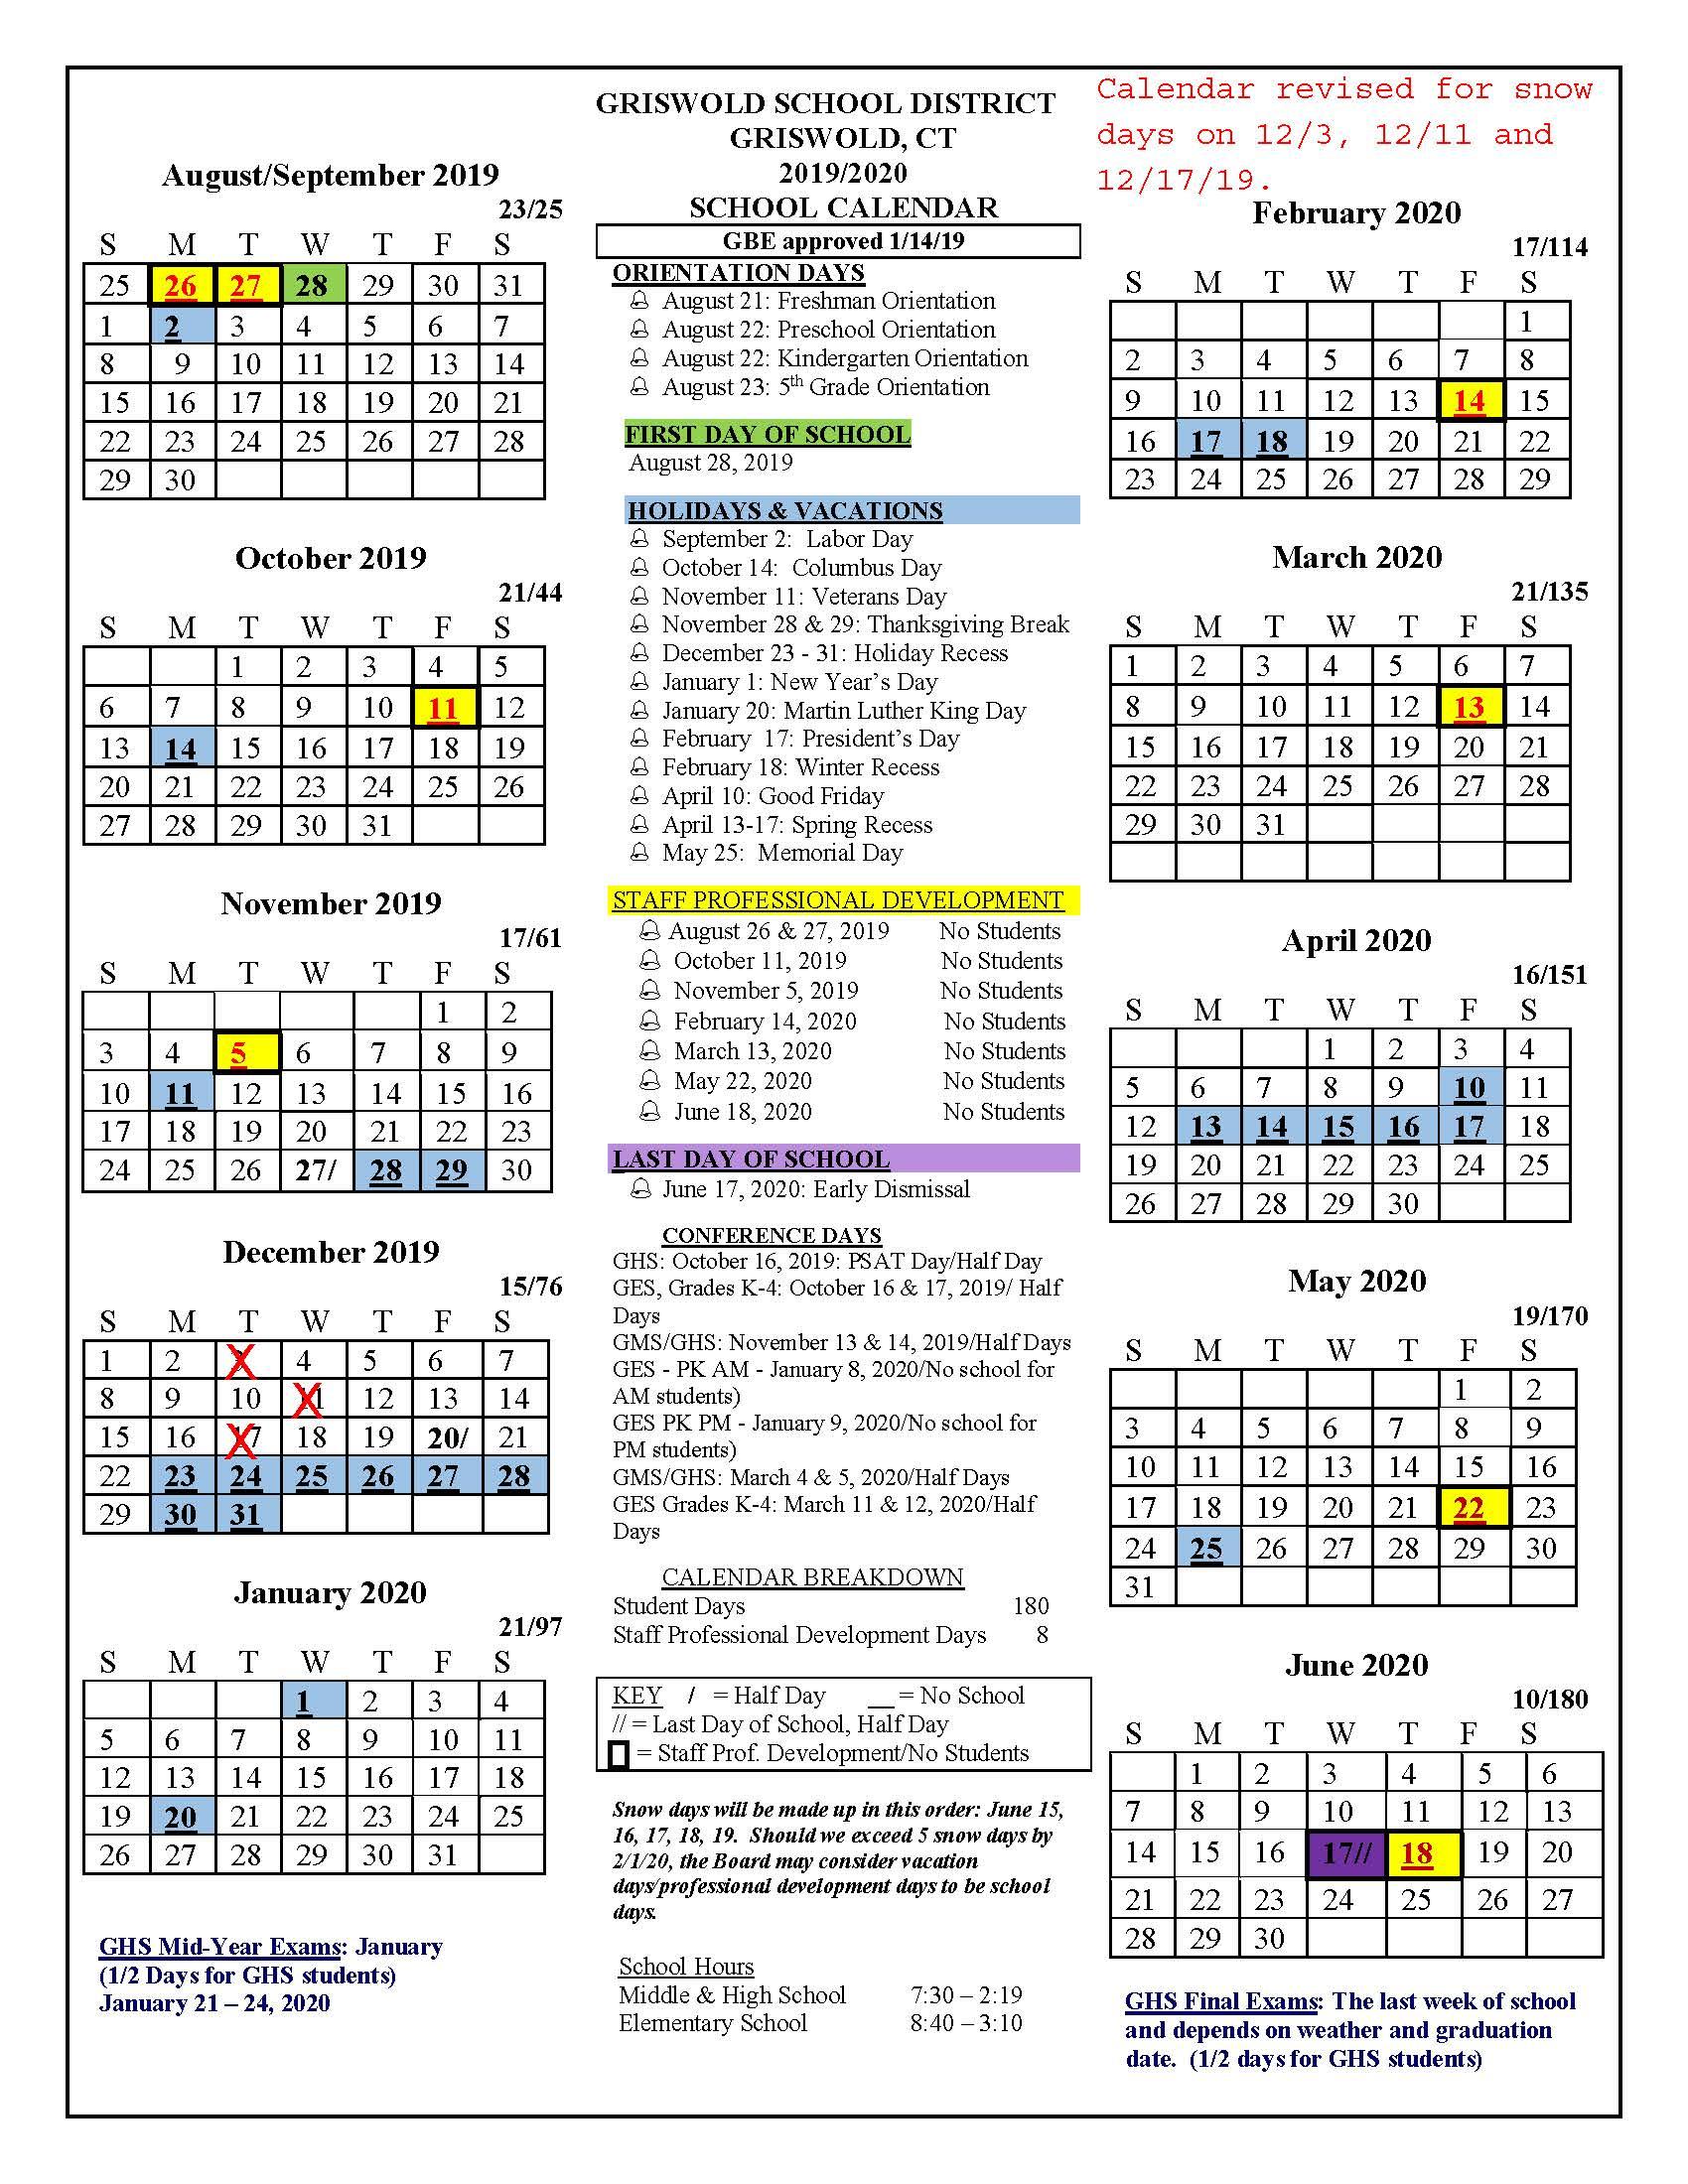 Univ Of Rhode Island School Calendar | Printable Calendar Intended For Gcu Academic Calendar Non Traditional 2020